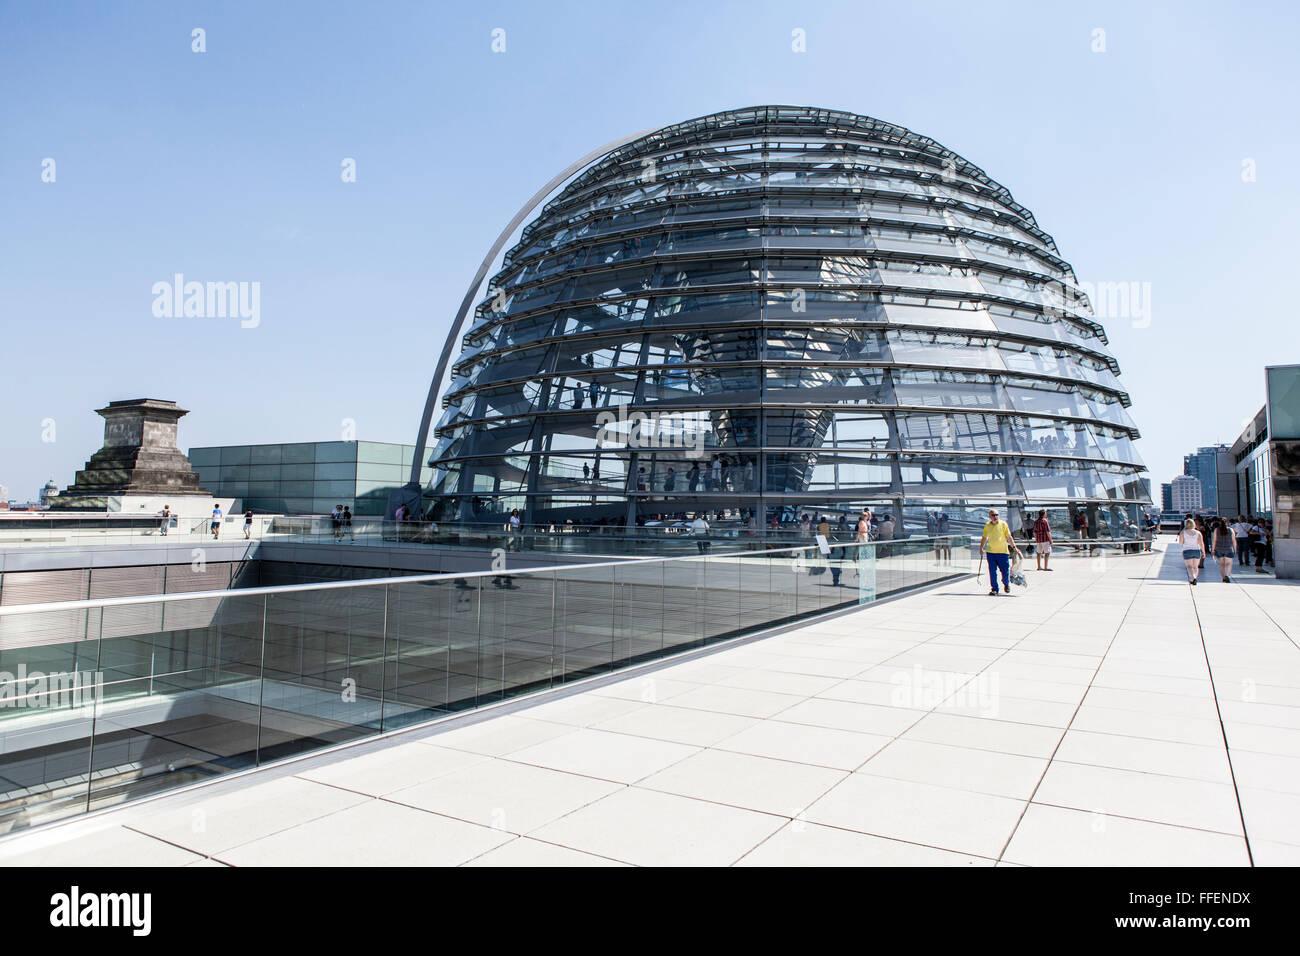 Glass Dome Berlin Stock Photos & Glass Dome Berlin Stock